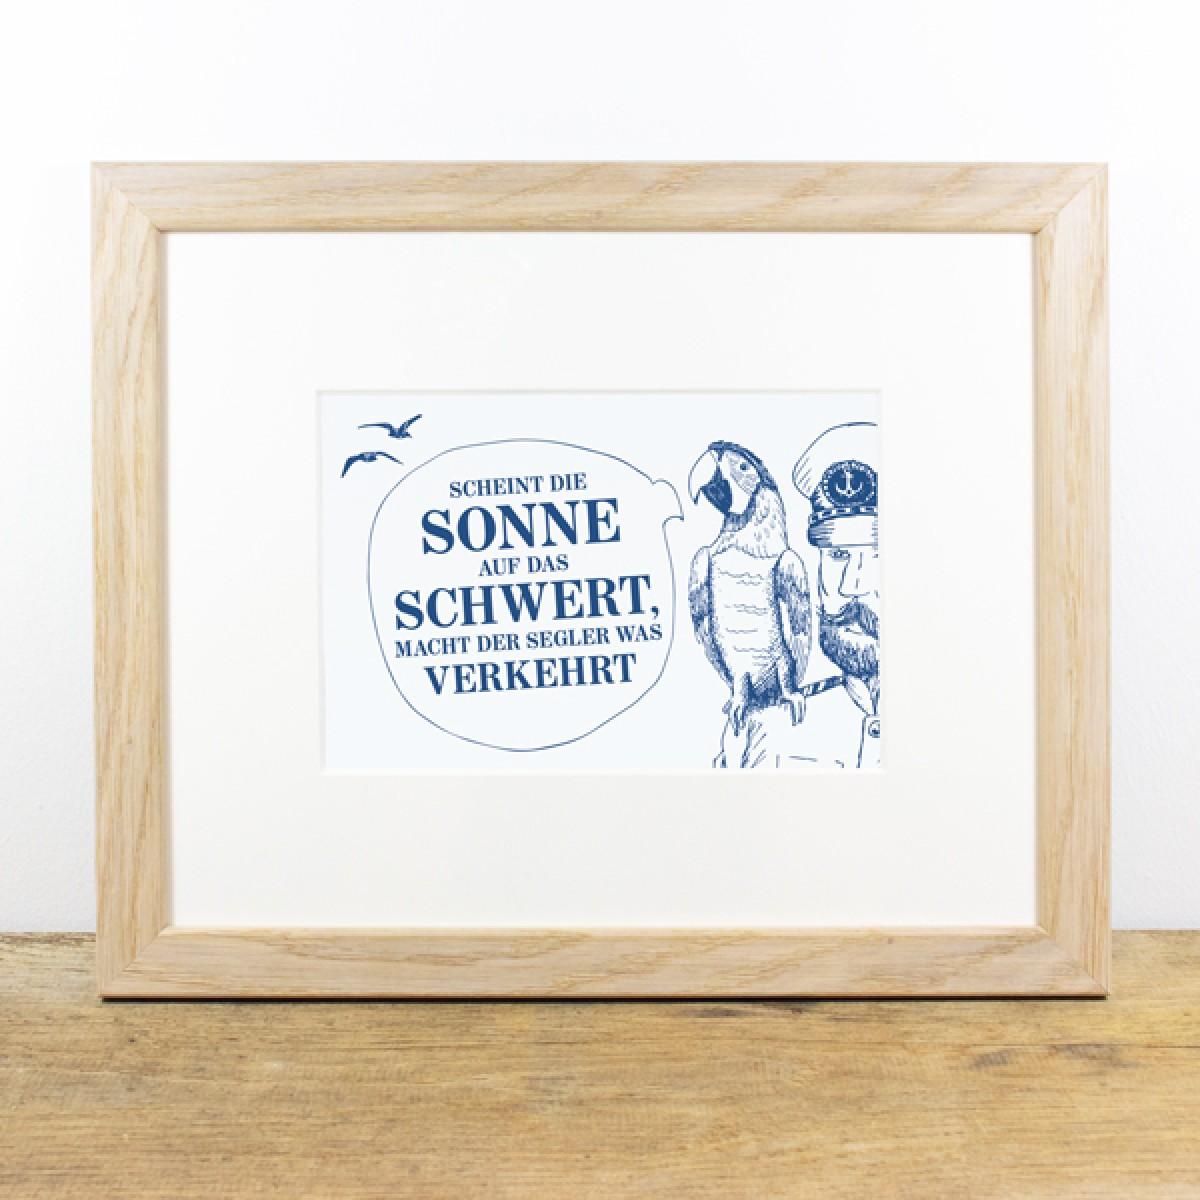 Bow & Hummingbird Bild mit Echtholzrahmen - Käpt´ns Weisheit I